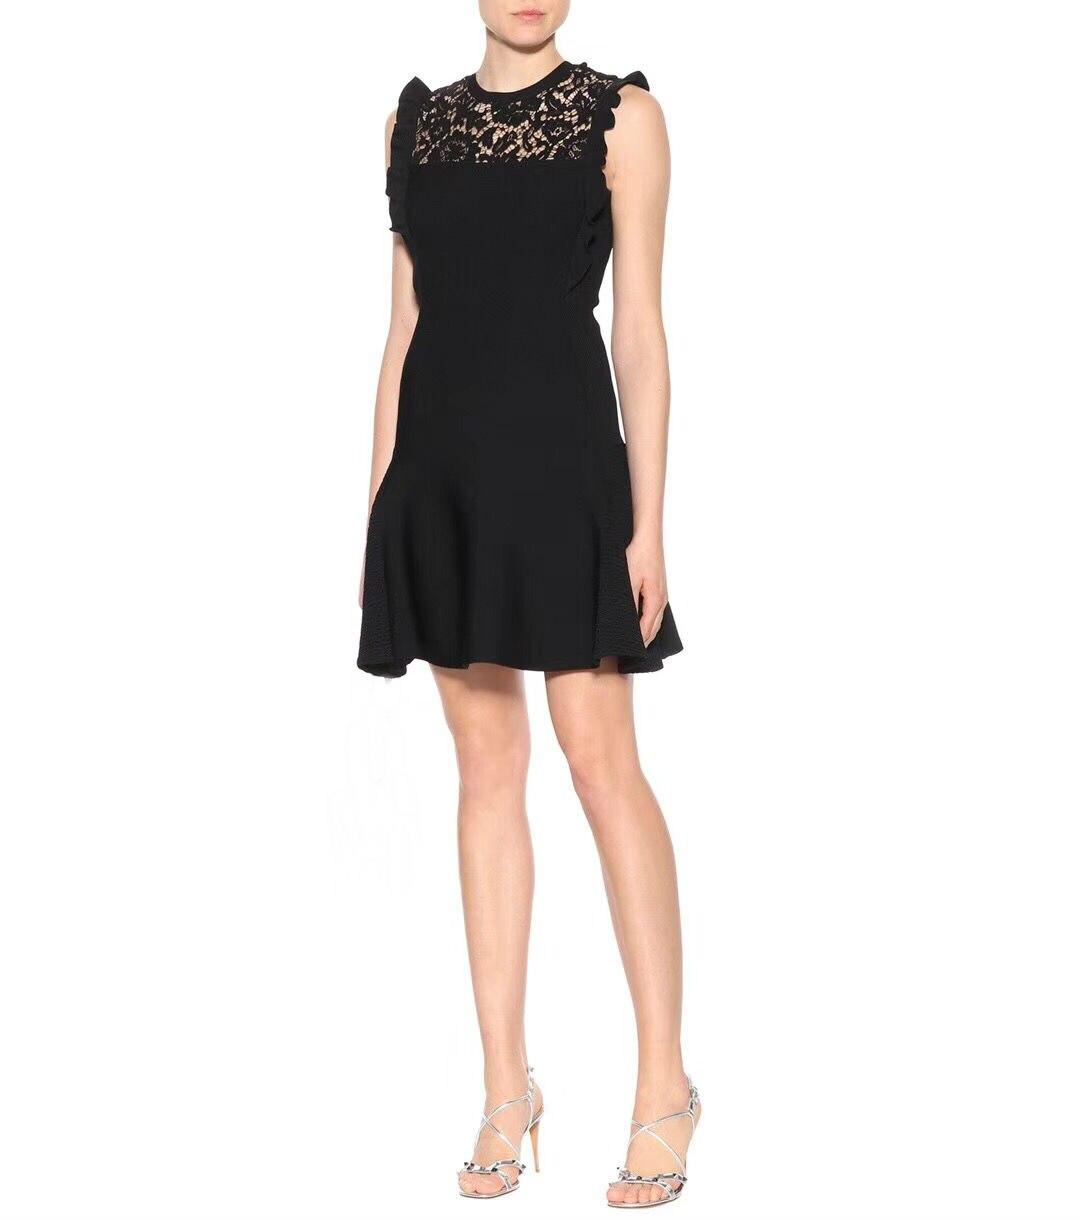 2018 New Arrival Summer Fashion O-Neck Sleeveless Hollow Lace Flounced Knit Black Women Dress Free Shipping